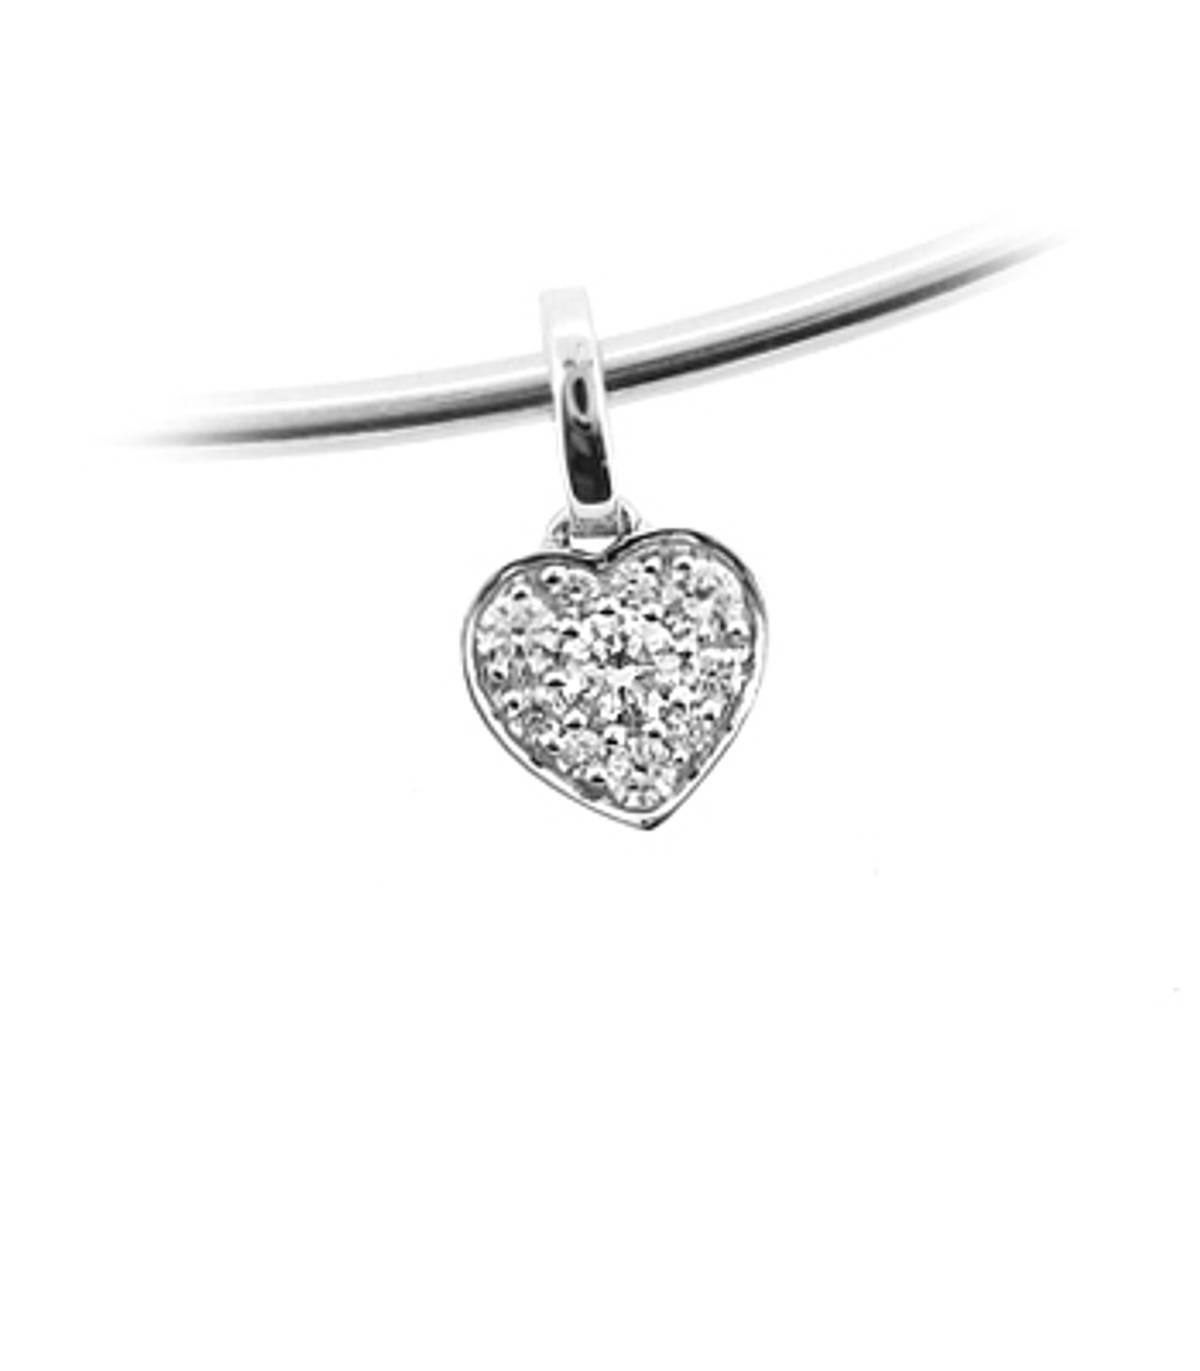 "18k white gold brilliant cut diamond heartshape cluster pendant on 18k white gold 18"" chain DETAILS Carat: total diamond weight 0.25cts  Pendant length 1.3cmPendant width 0.8cm"